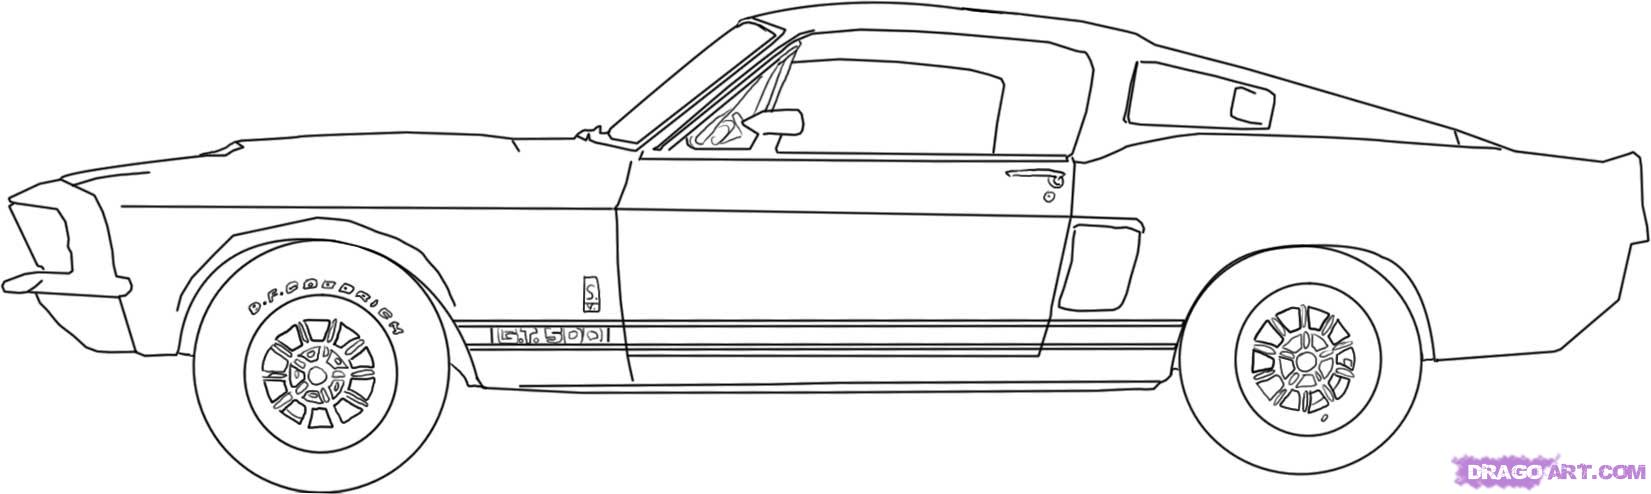 Рисуем автомобиль Shelby Mustang GT500 1967 года